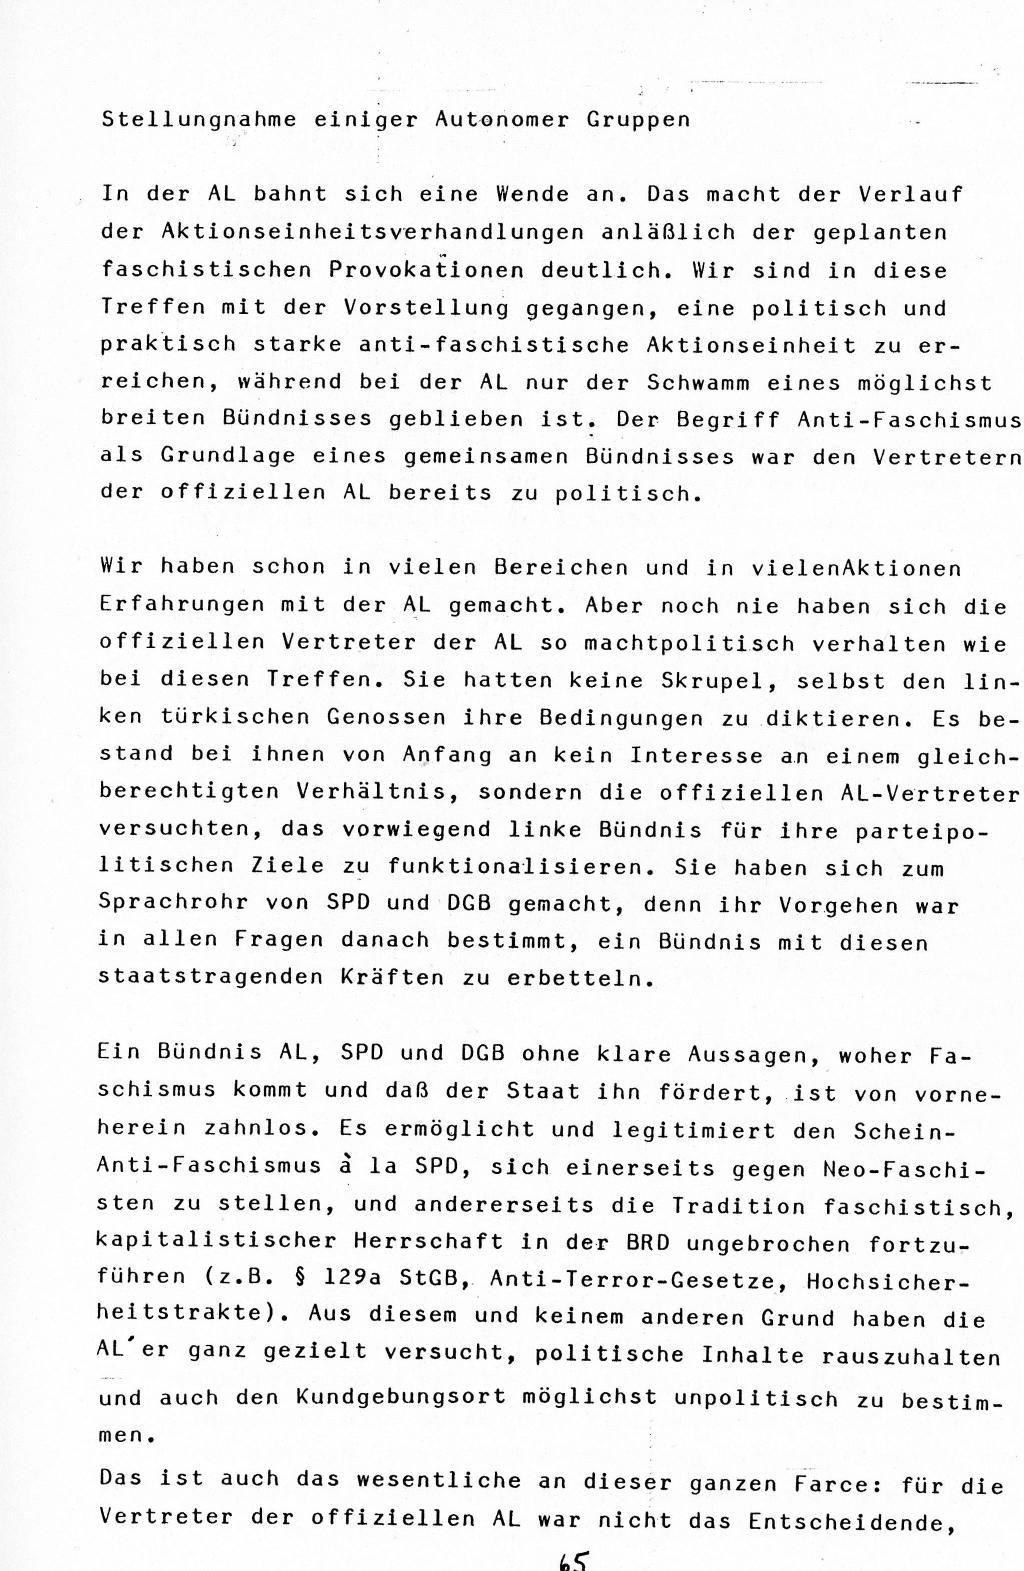 Berlin_1983_Autonome_Gruppen_Faschismus_im_Kapitalismus_65